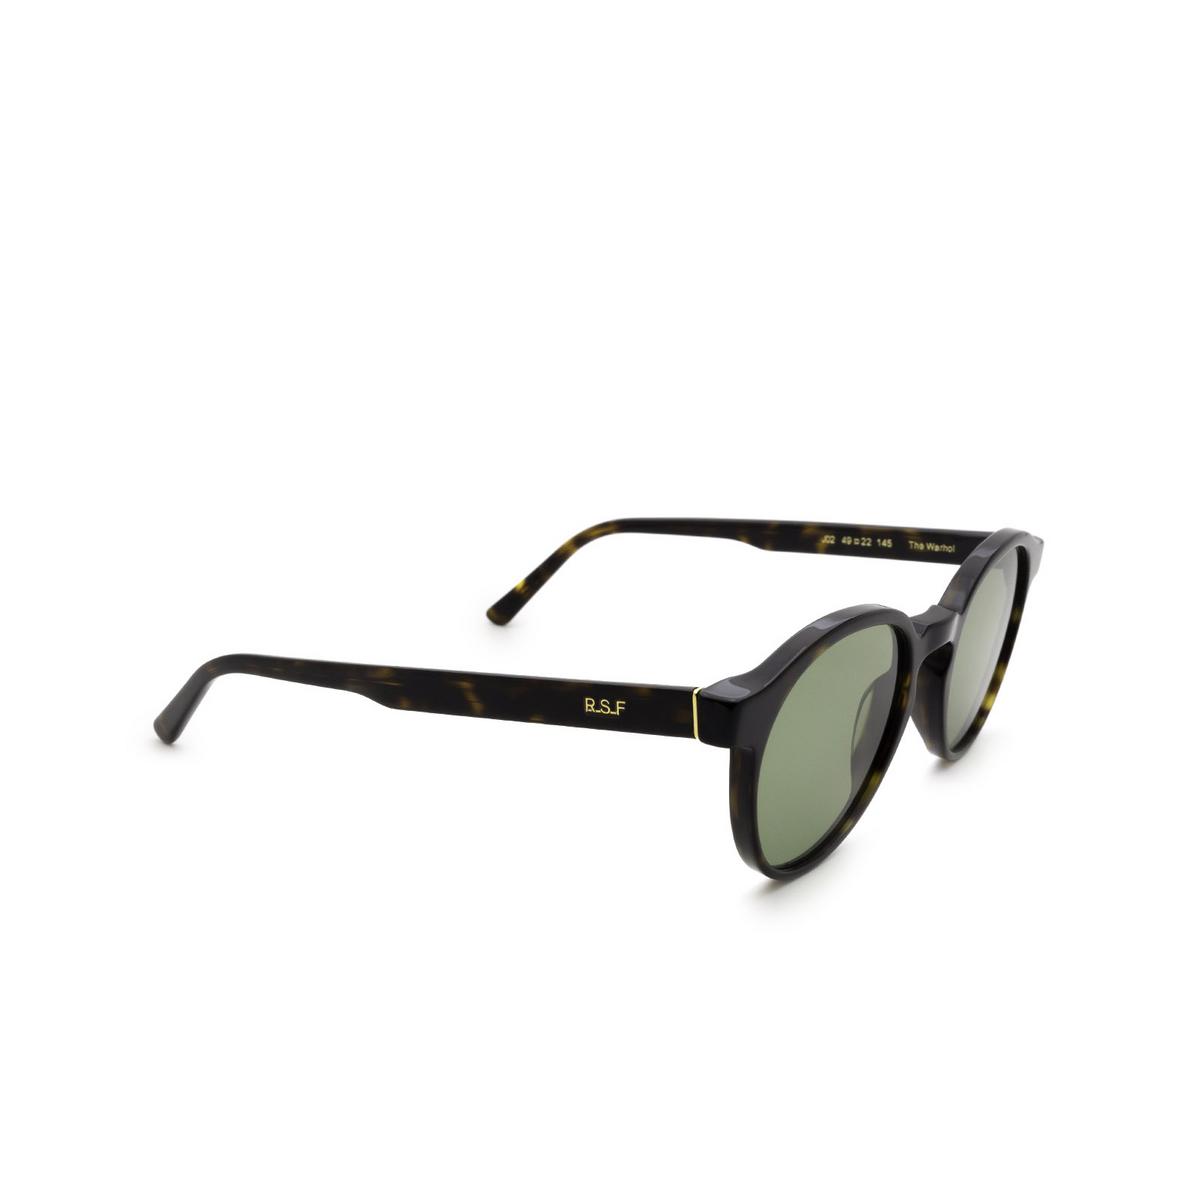 Retrosuperfuture® Round Sunglasses: The Warhol color 3627 J02 - three-quarters view.